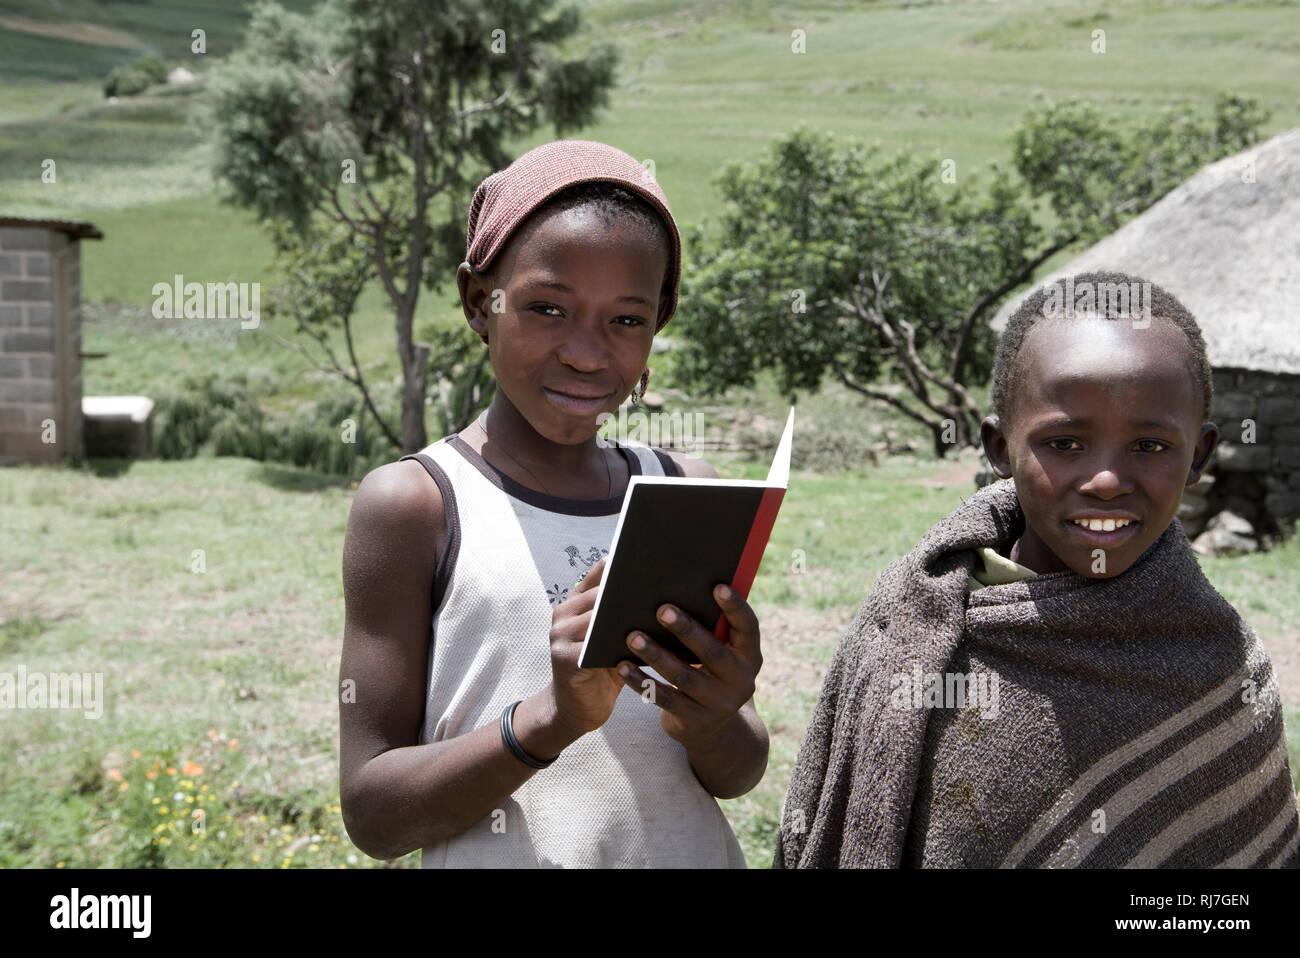 Kinder mit Schulheft - Stock Image